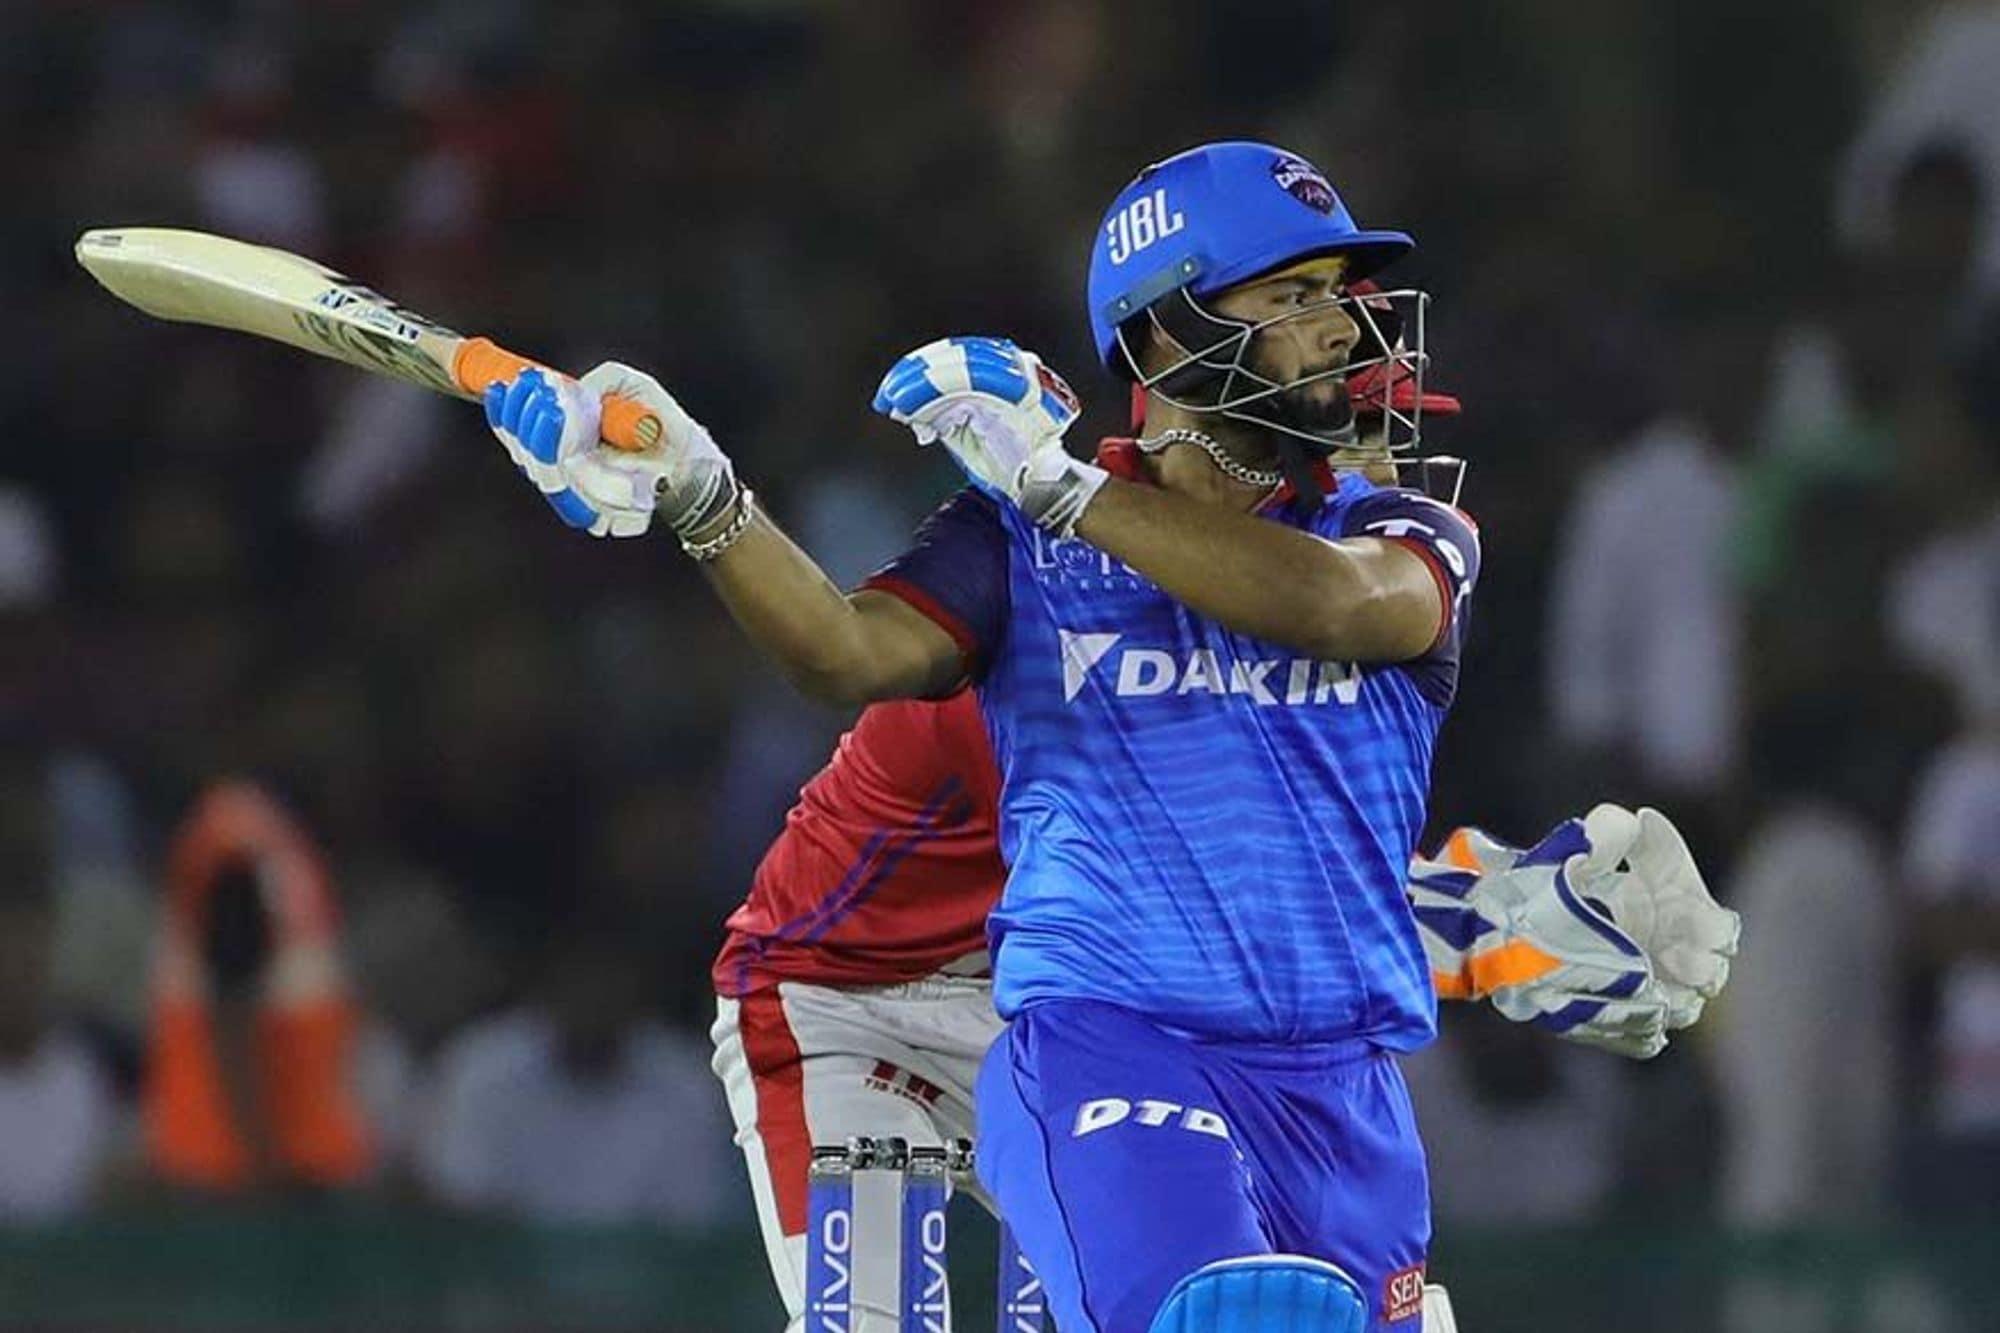 In Pics | IPL 2019, Match 13, KXIP vs DC